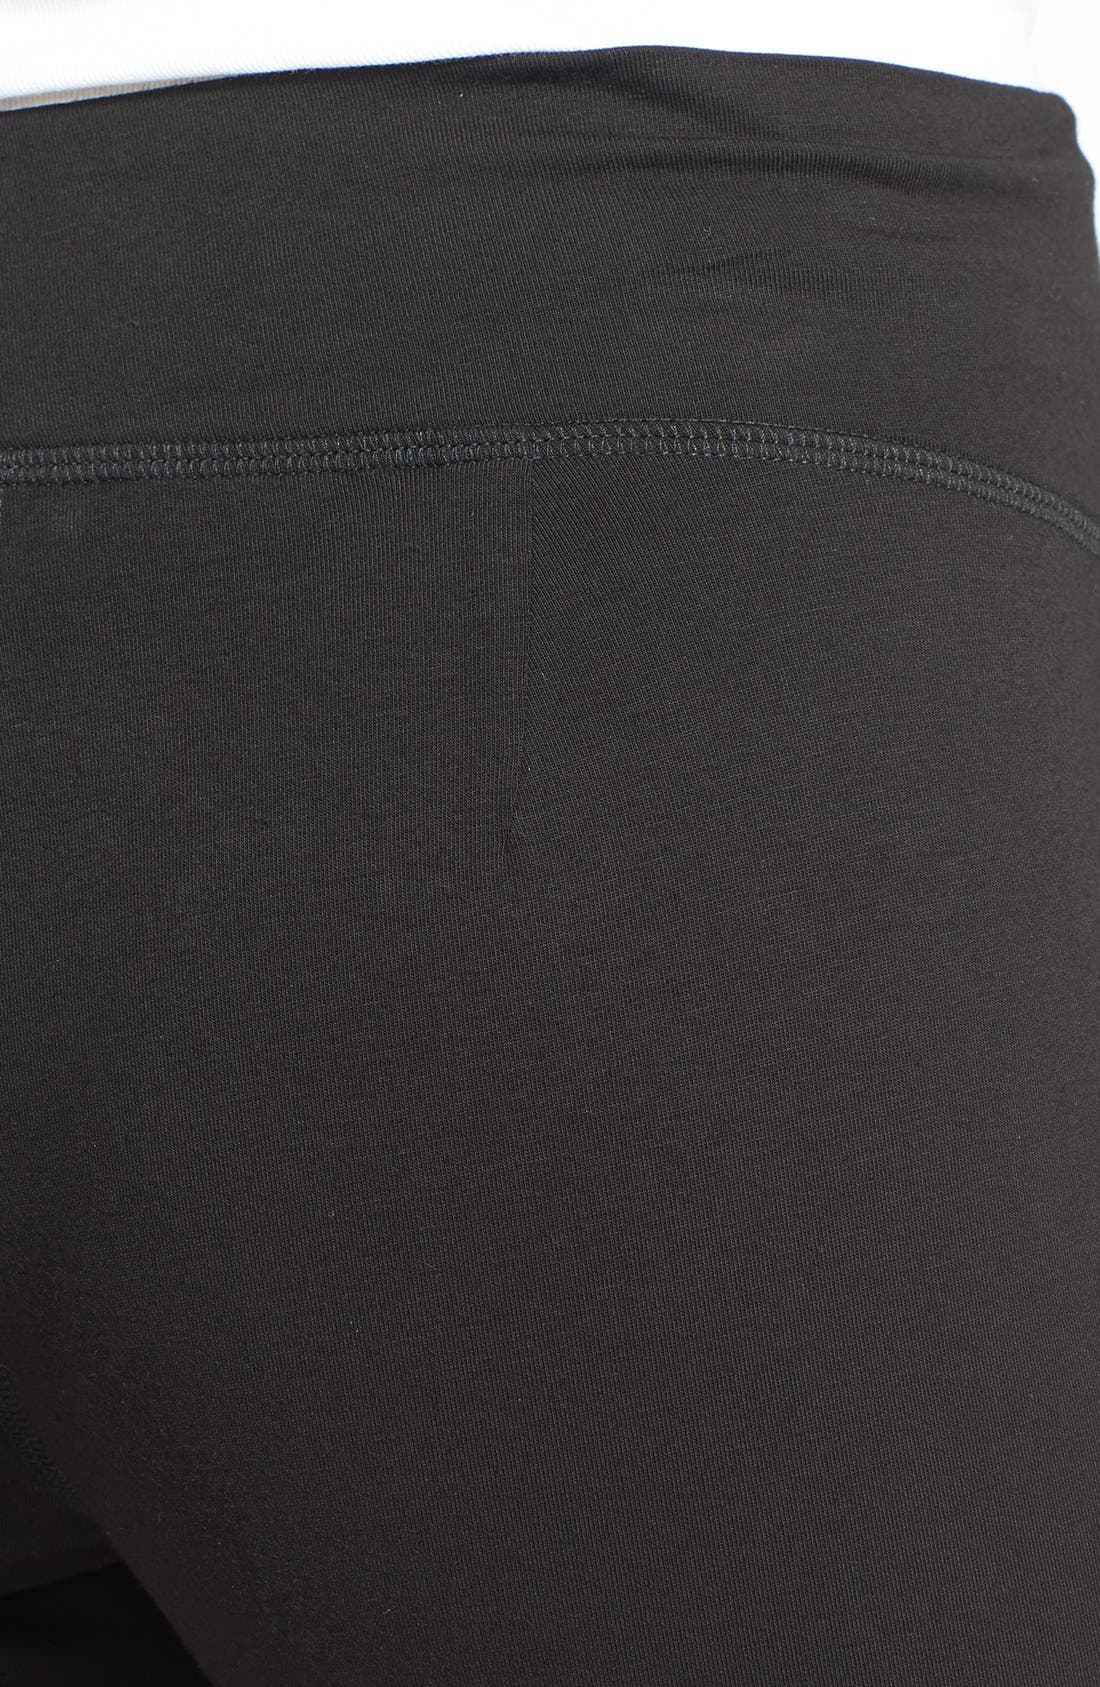 Alternate Image 3  - Eileen Fisher Organic Cotton Yoga Pants (Regular & Petite)